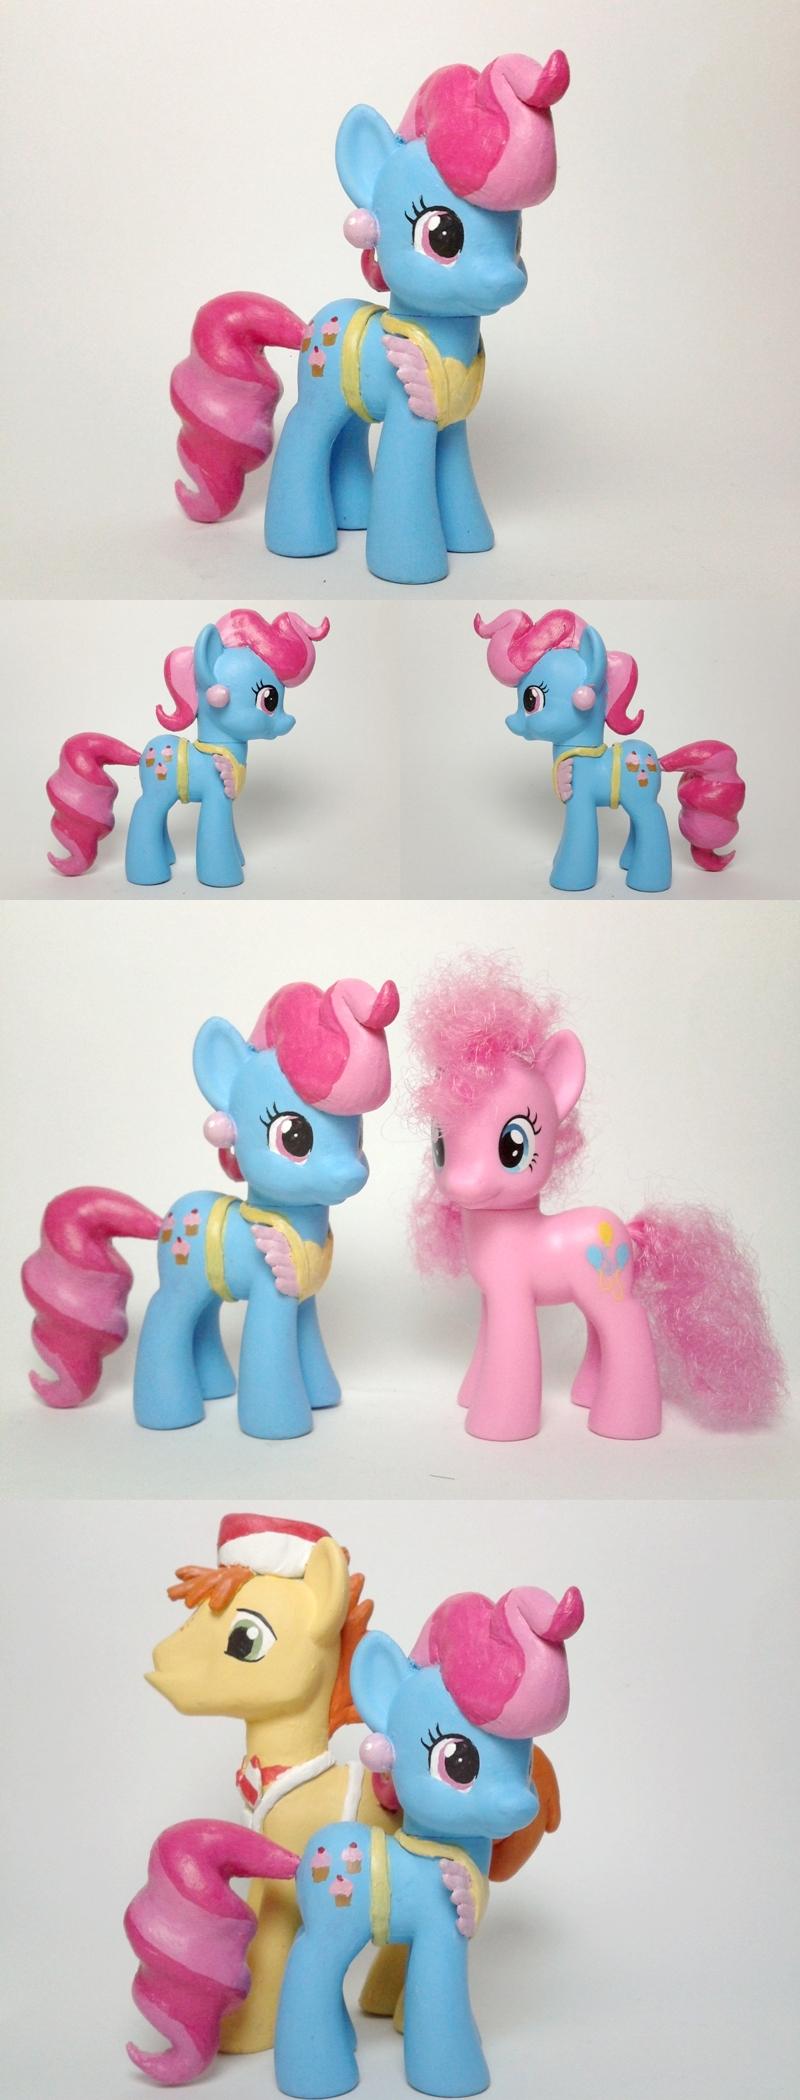 Mrs Cup Cake G4 Custom Pony by Oak23